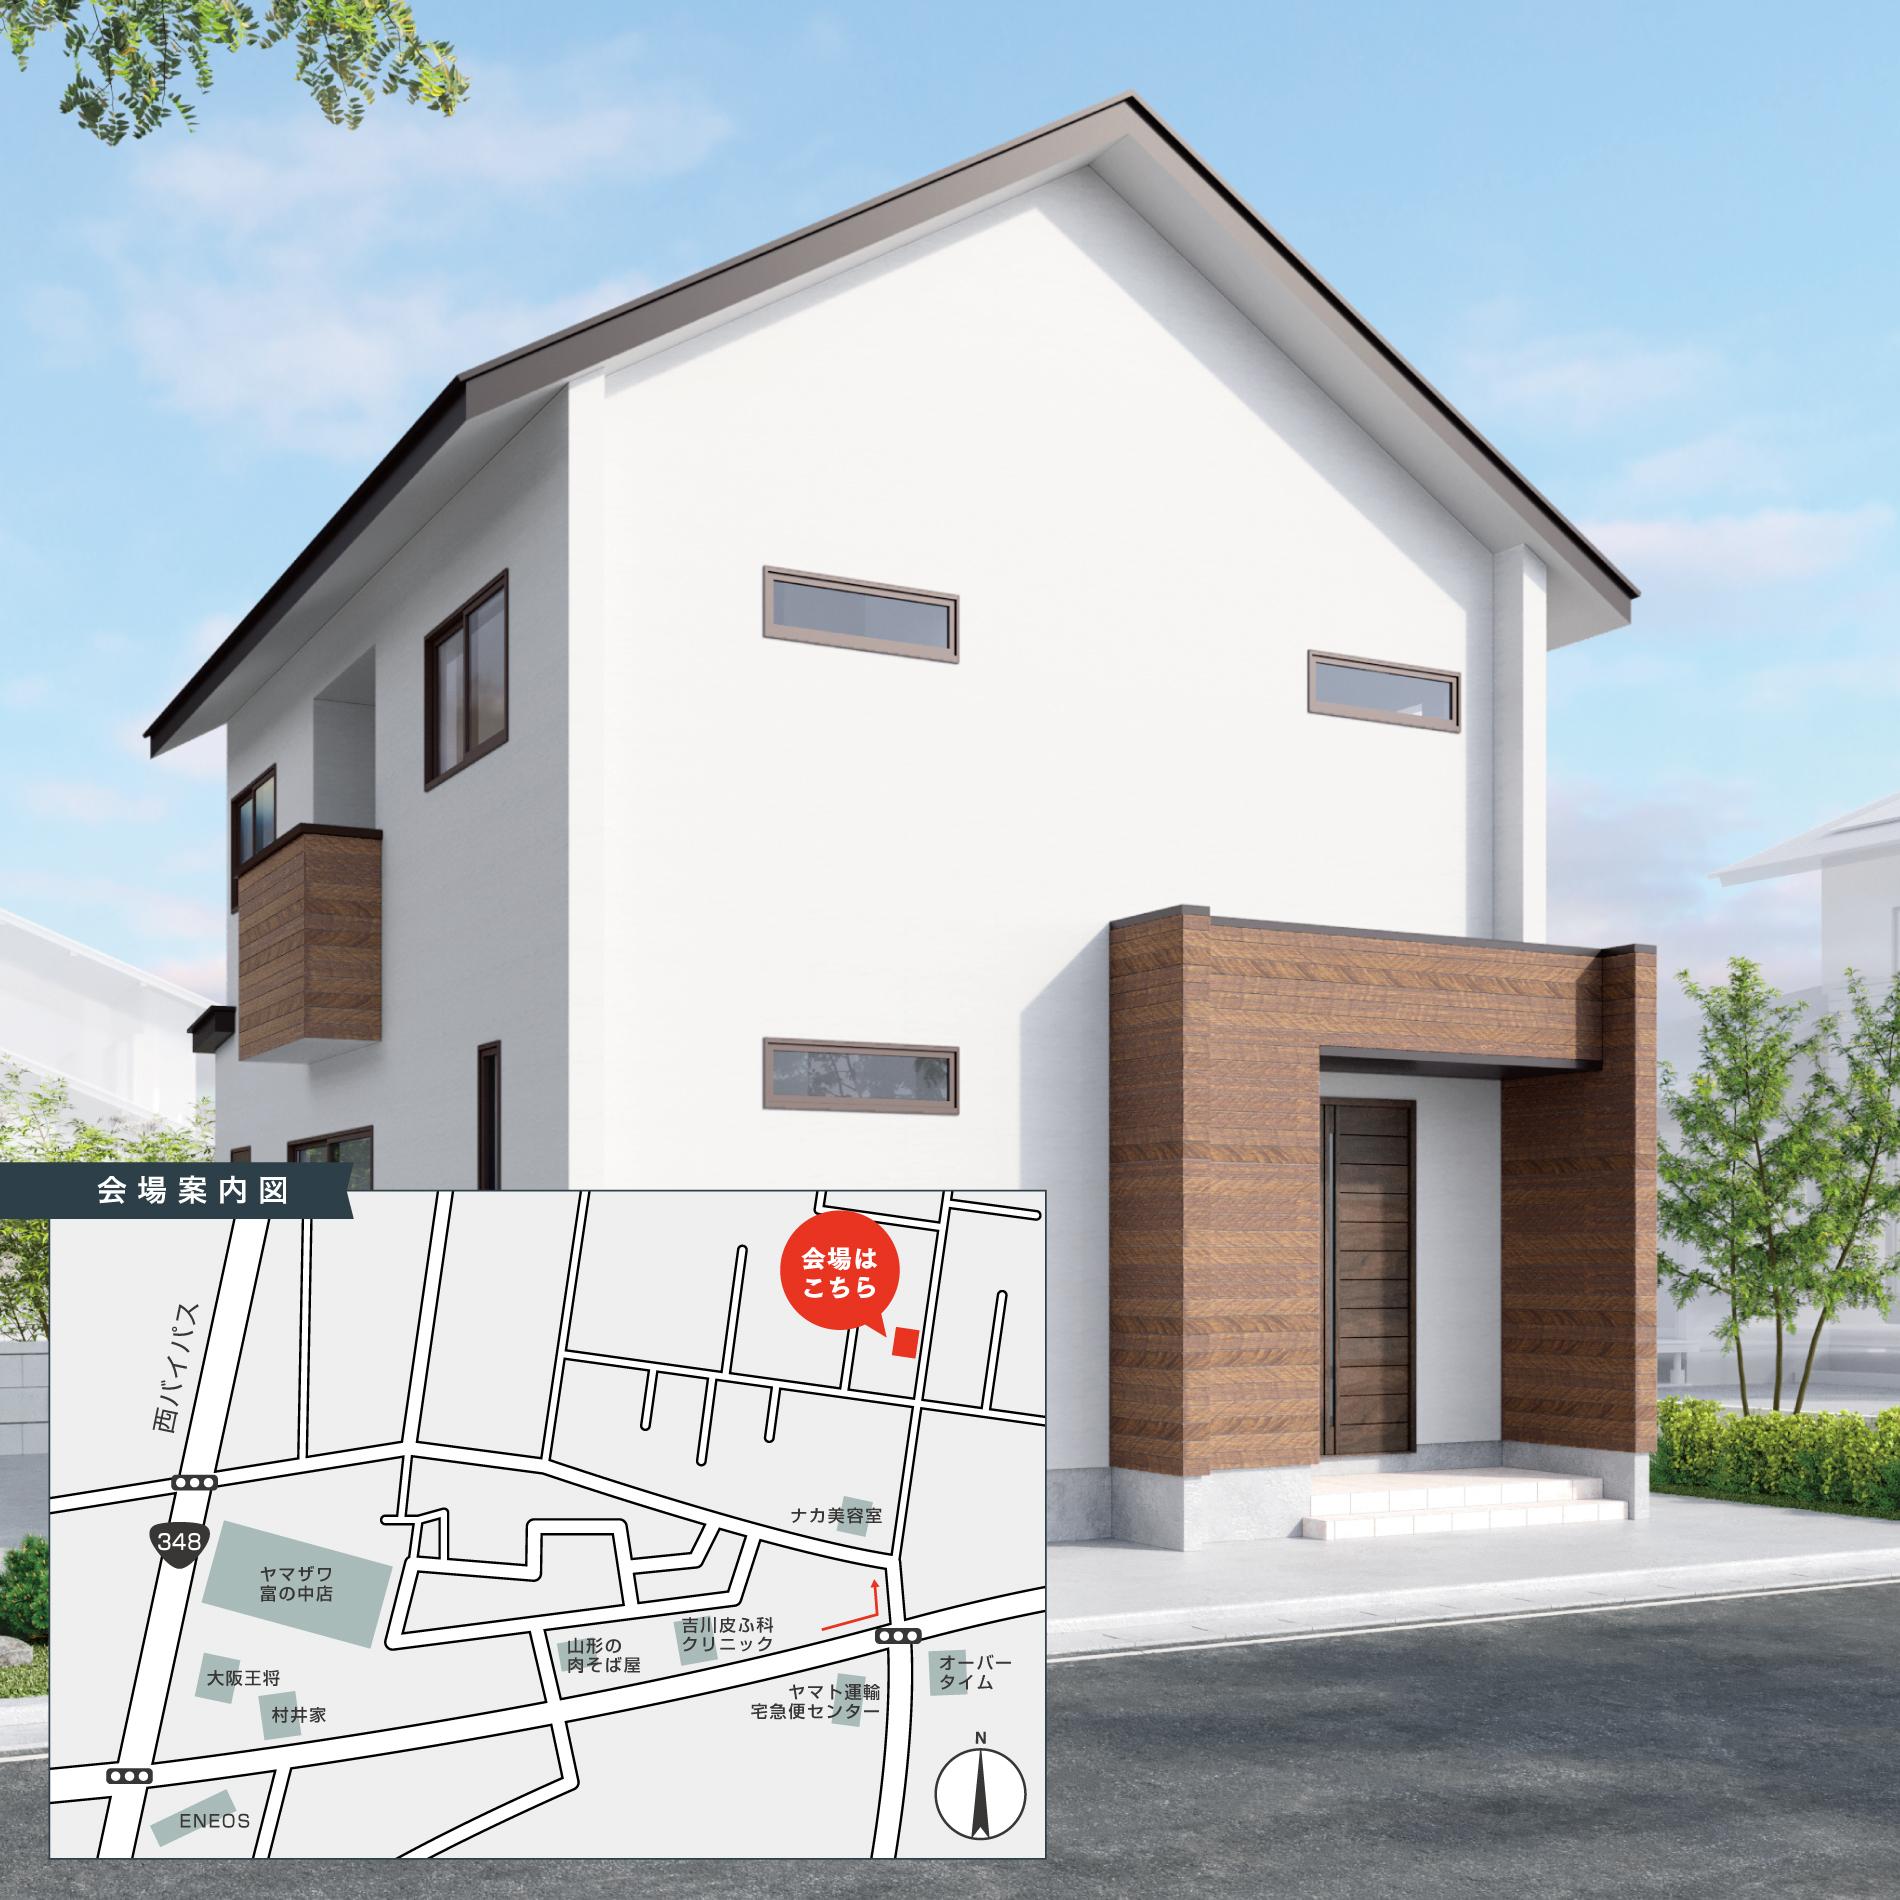 山形県山形市新築完成内覧会 山形の注文住宅なら近江建設へ